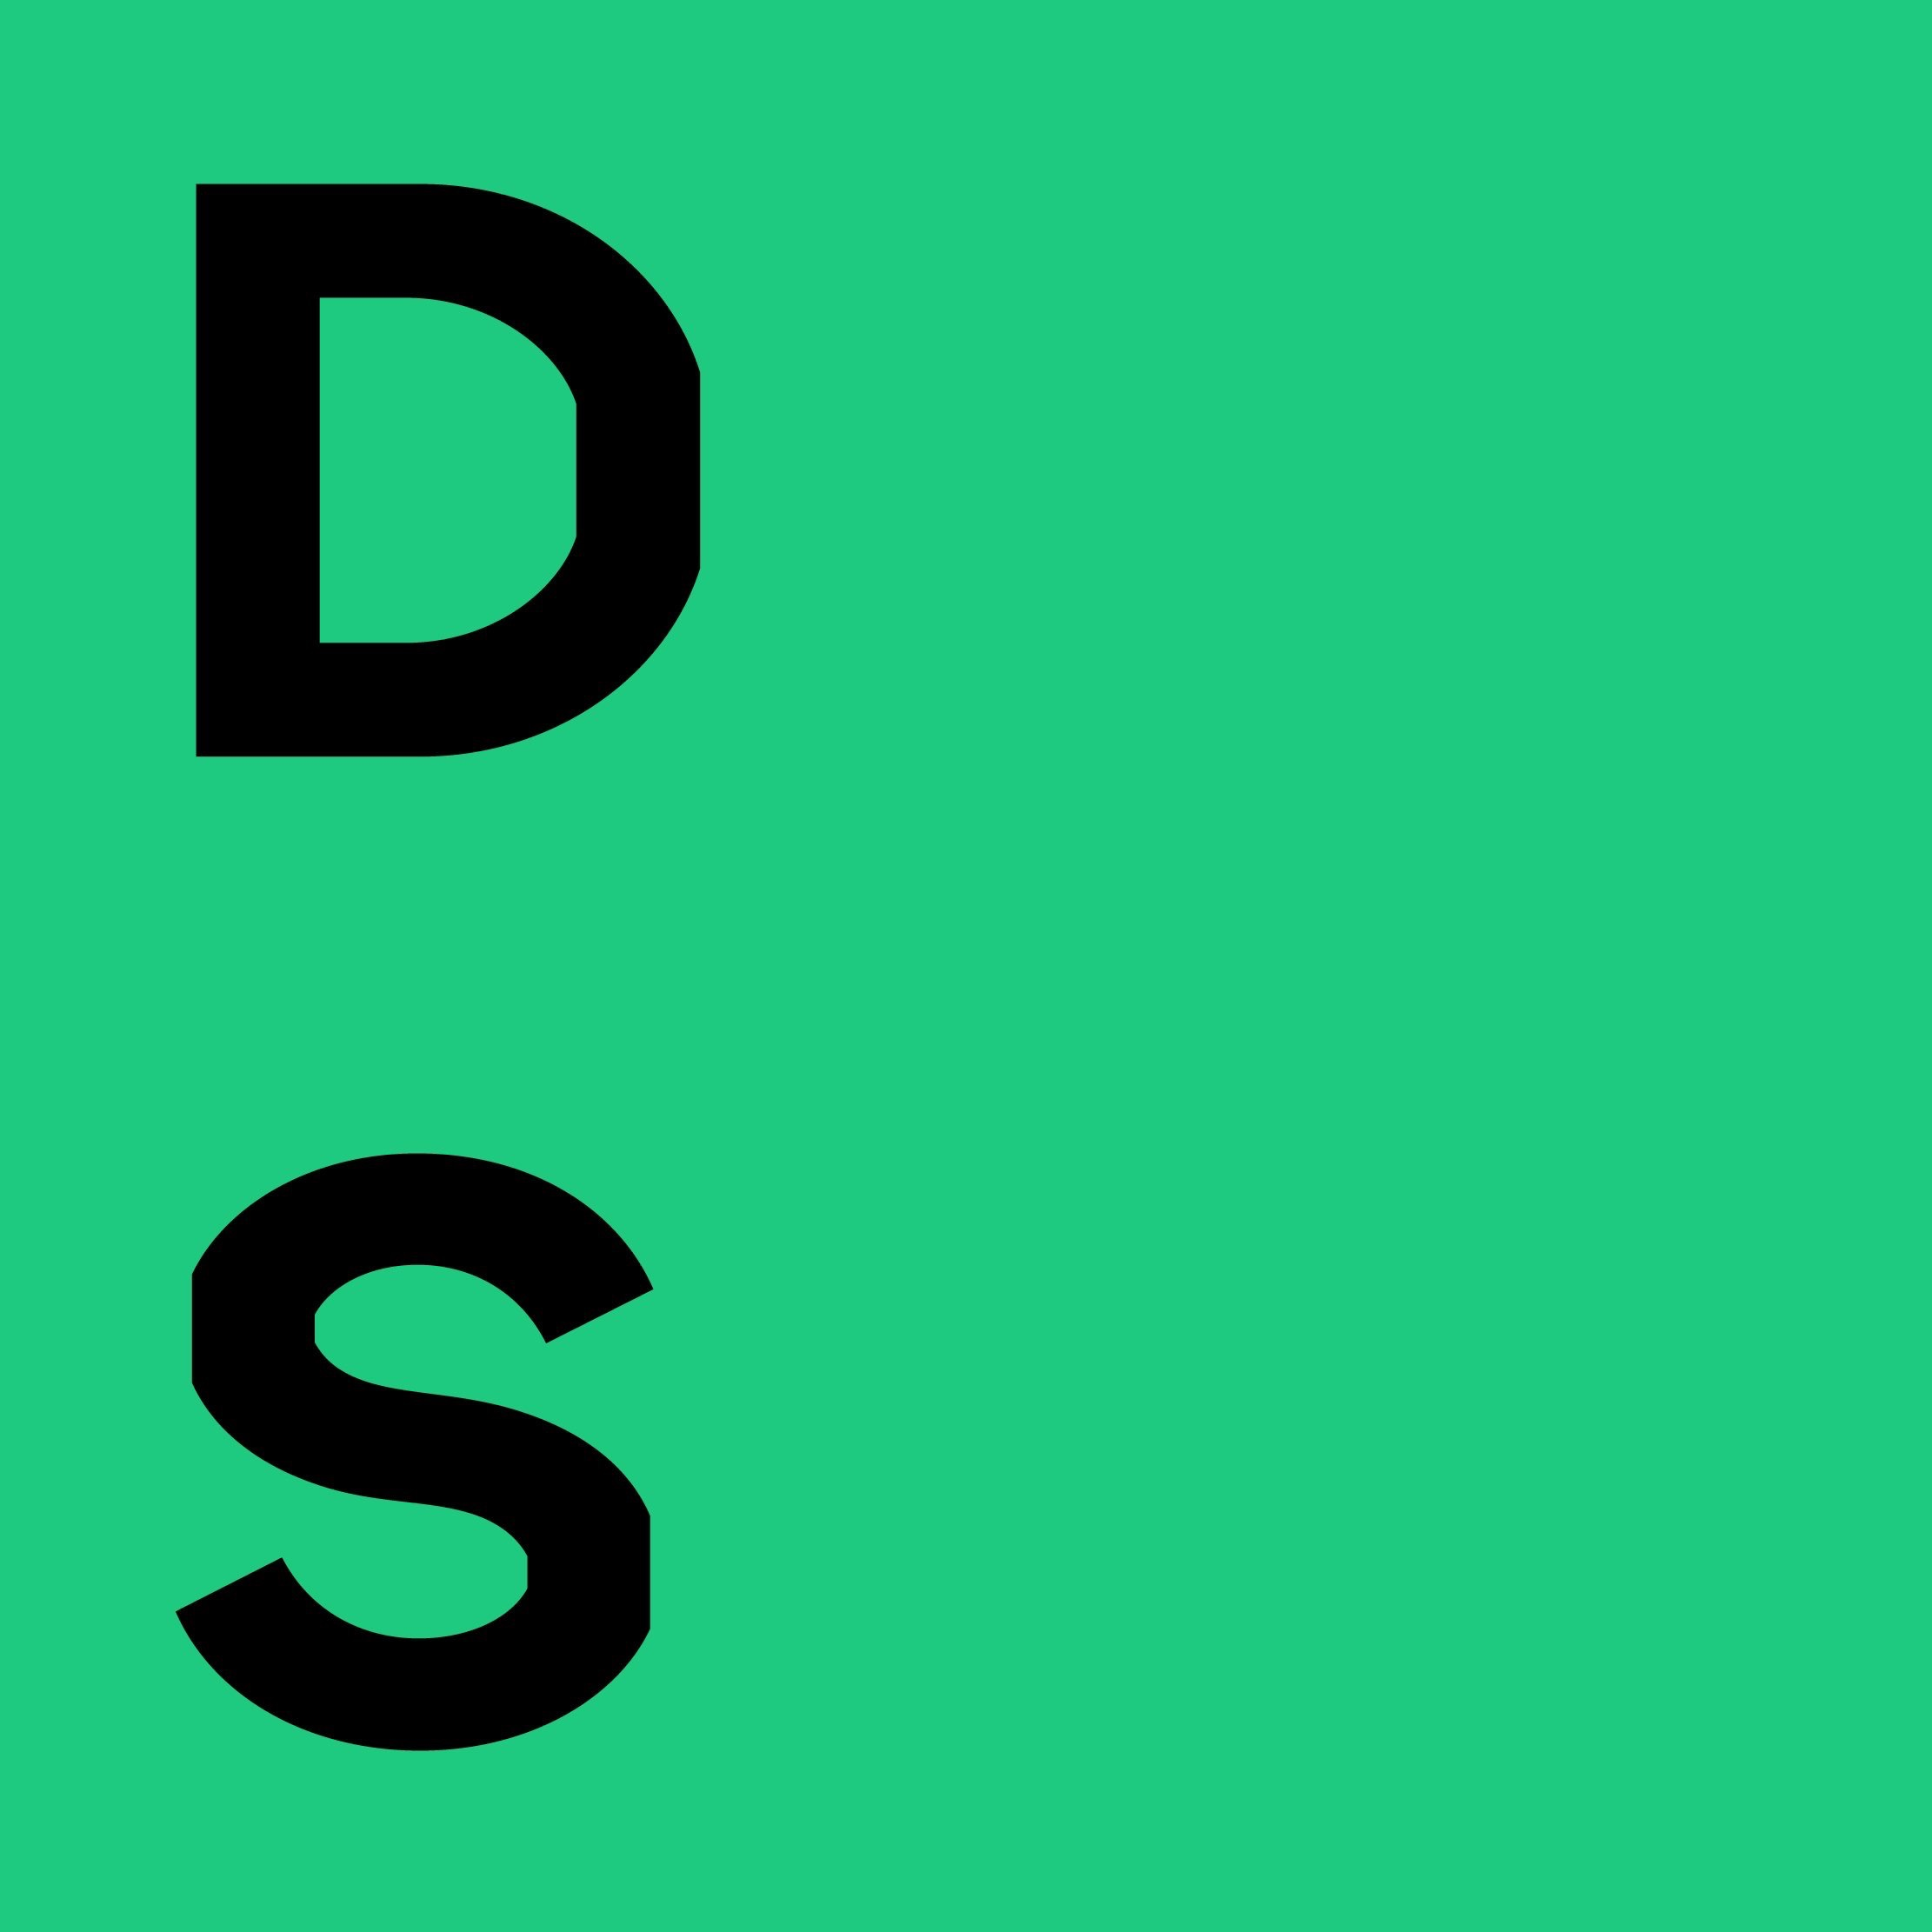 CLIENT:  Design Sweden  PROJECT:  Chairwoman of the Board | Roadmap 2018   THE BOARD:   Petrus Palmér   Daniel Byström   Sophia Wood   Ramiro Oblitas   Edvard Scott   Angela Tillman Sperandio